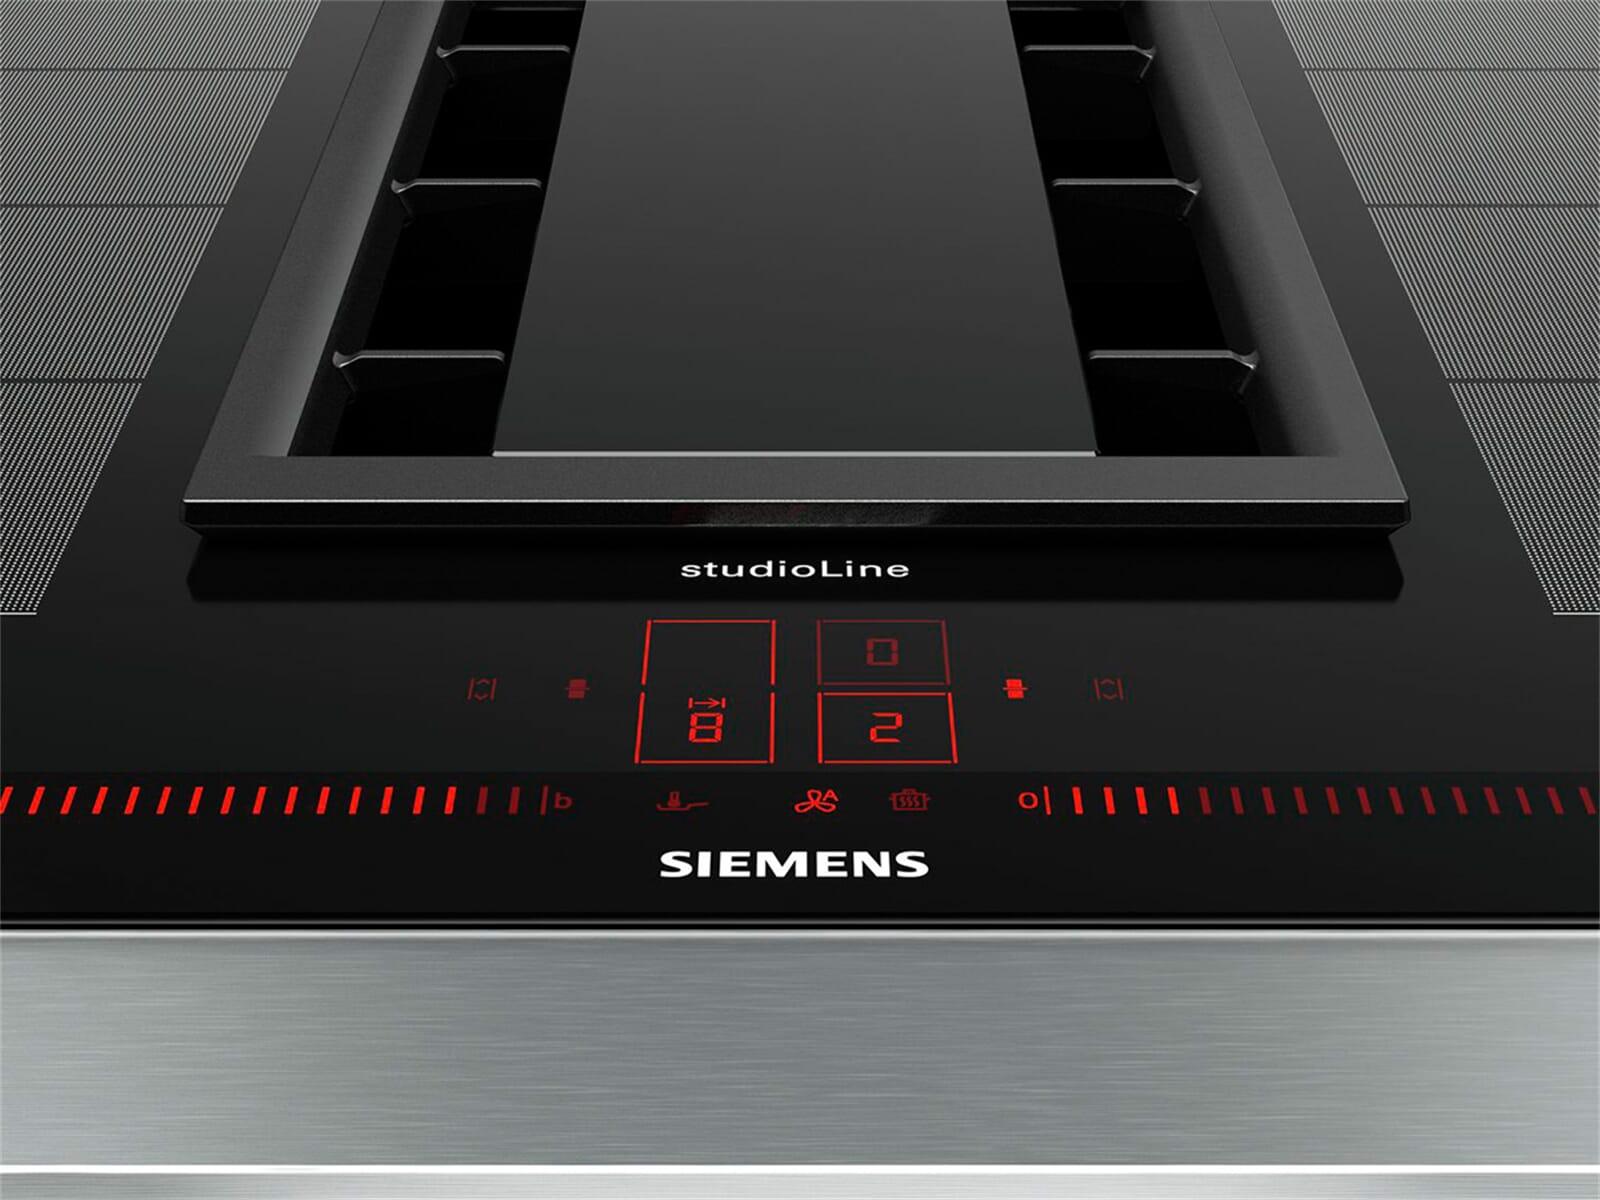 Siemens studioline ex877lx33e induktionskochfeld dunstabzug kombination